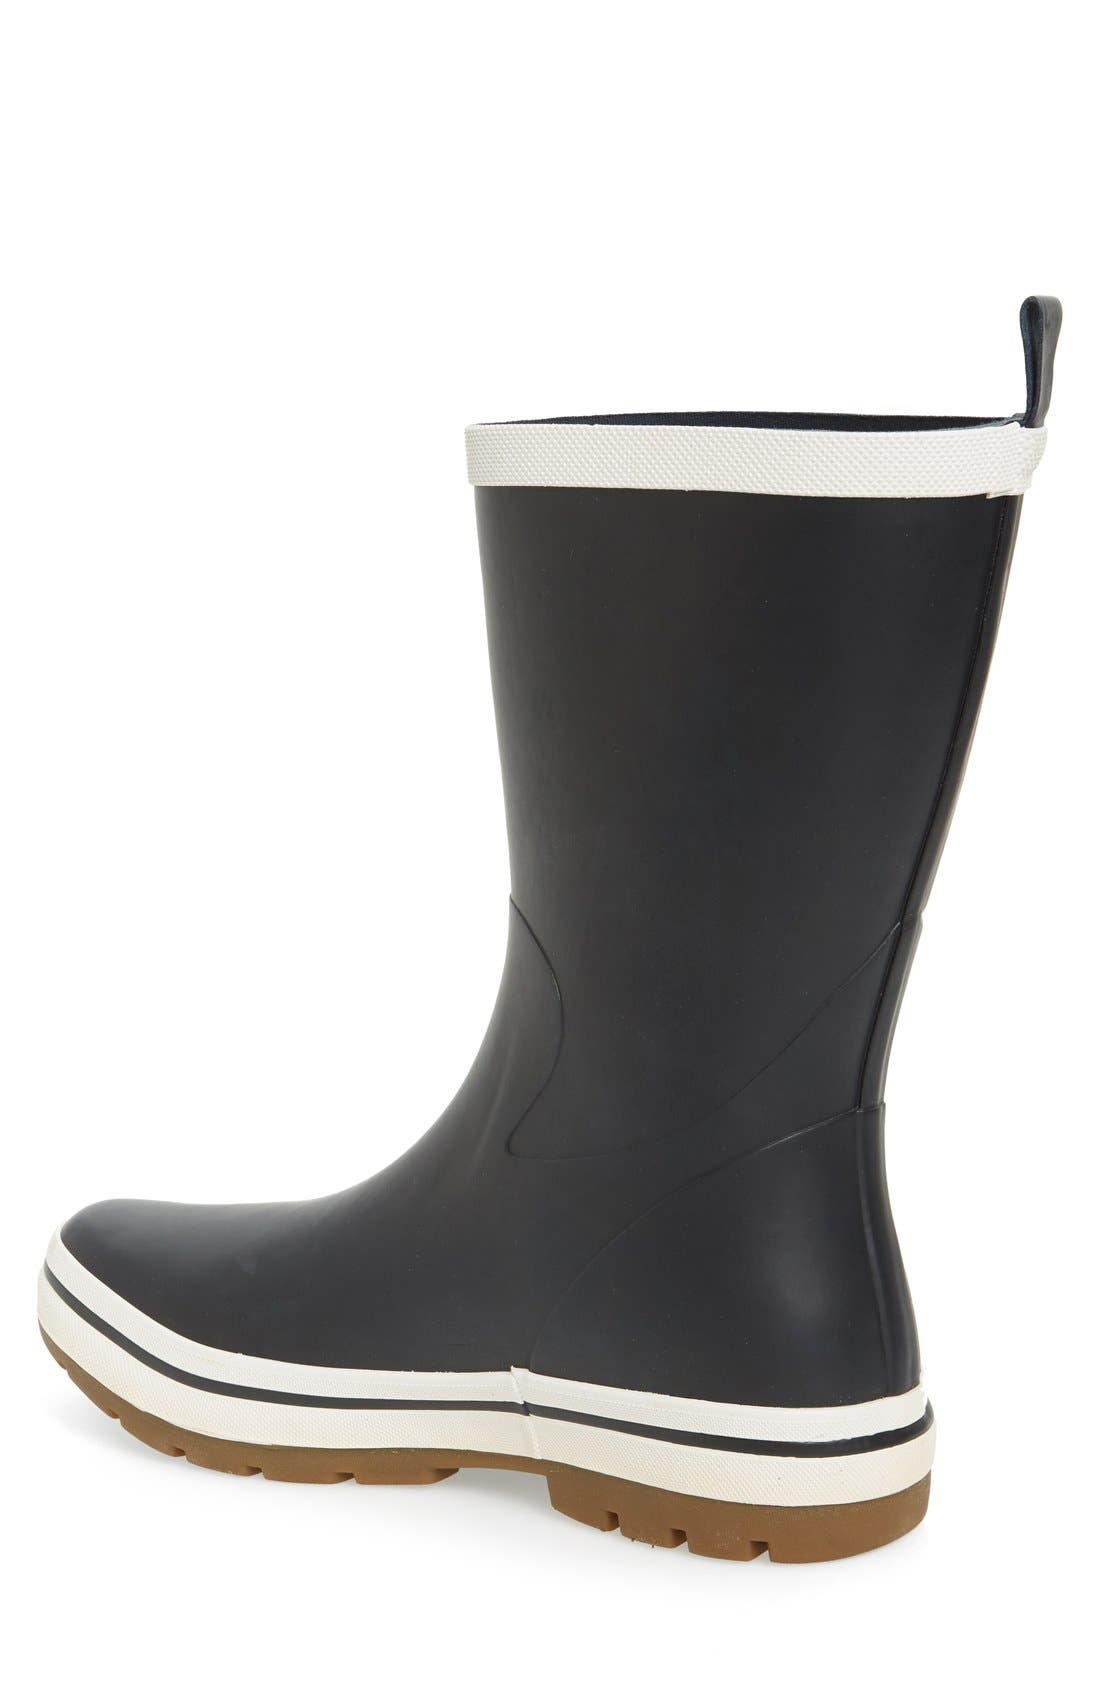 'Midsund 2' Rain Boot,                             Alternate thumbnail 2, color,                             Navy